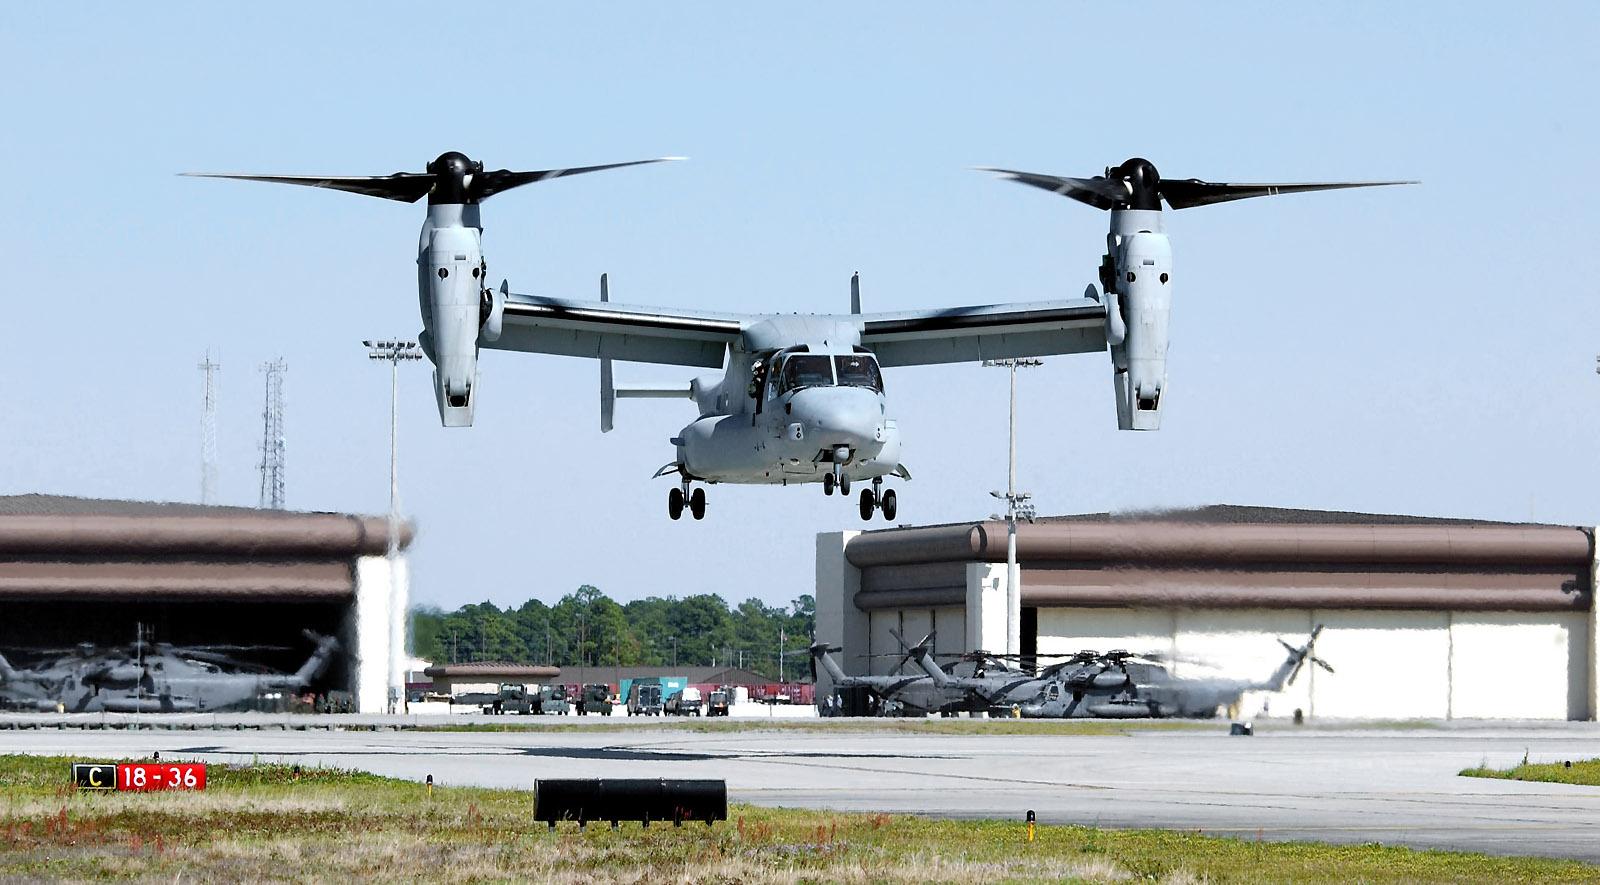 Osprey Elicottero : File mv osprey g wikimedia commons